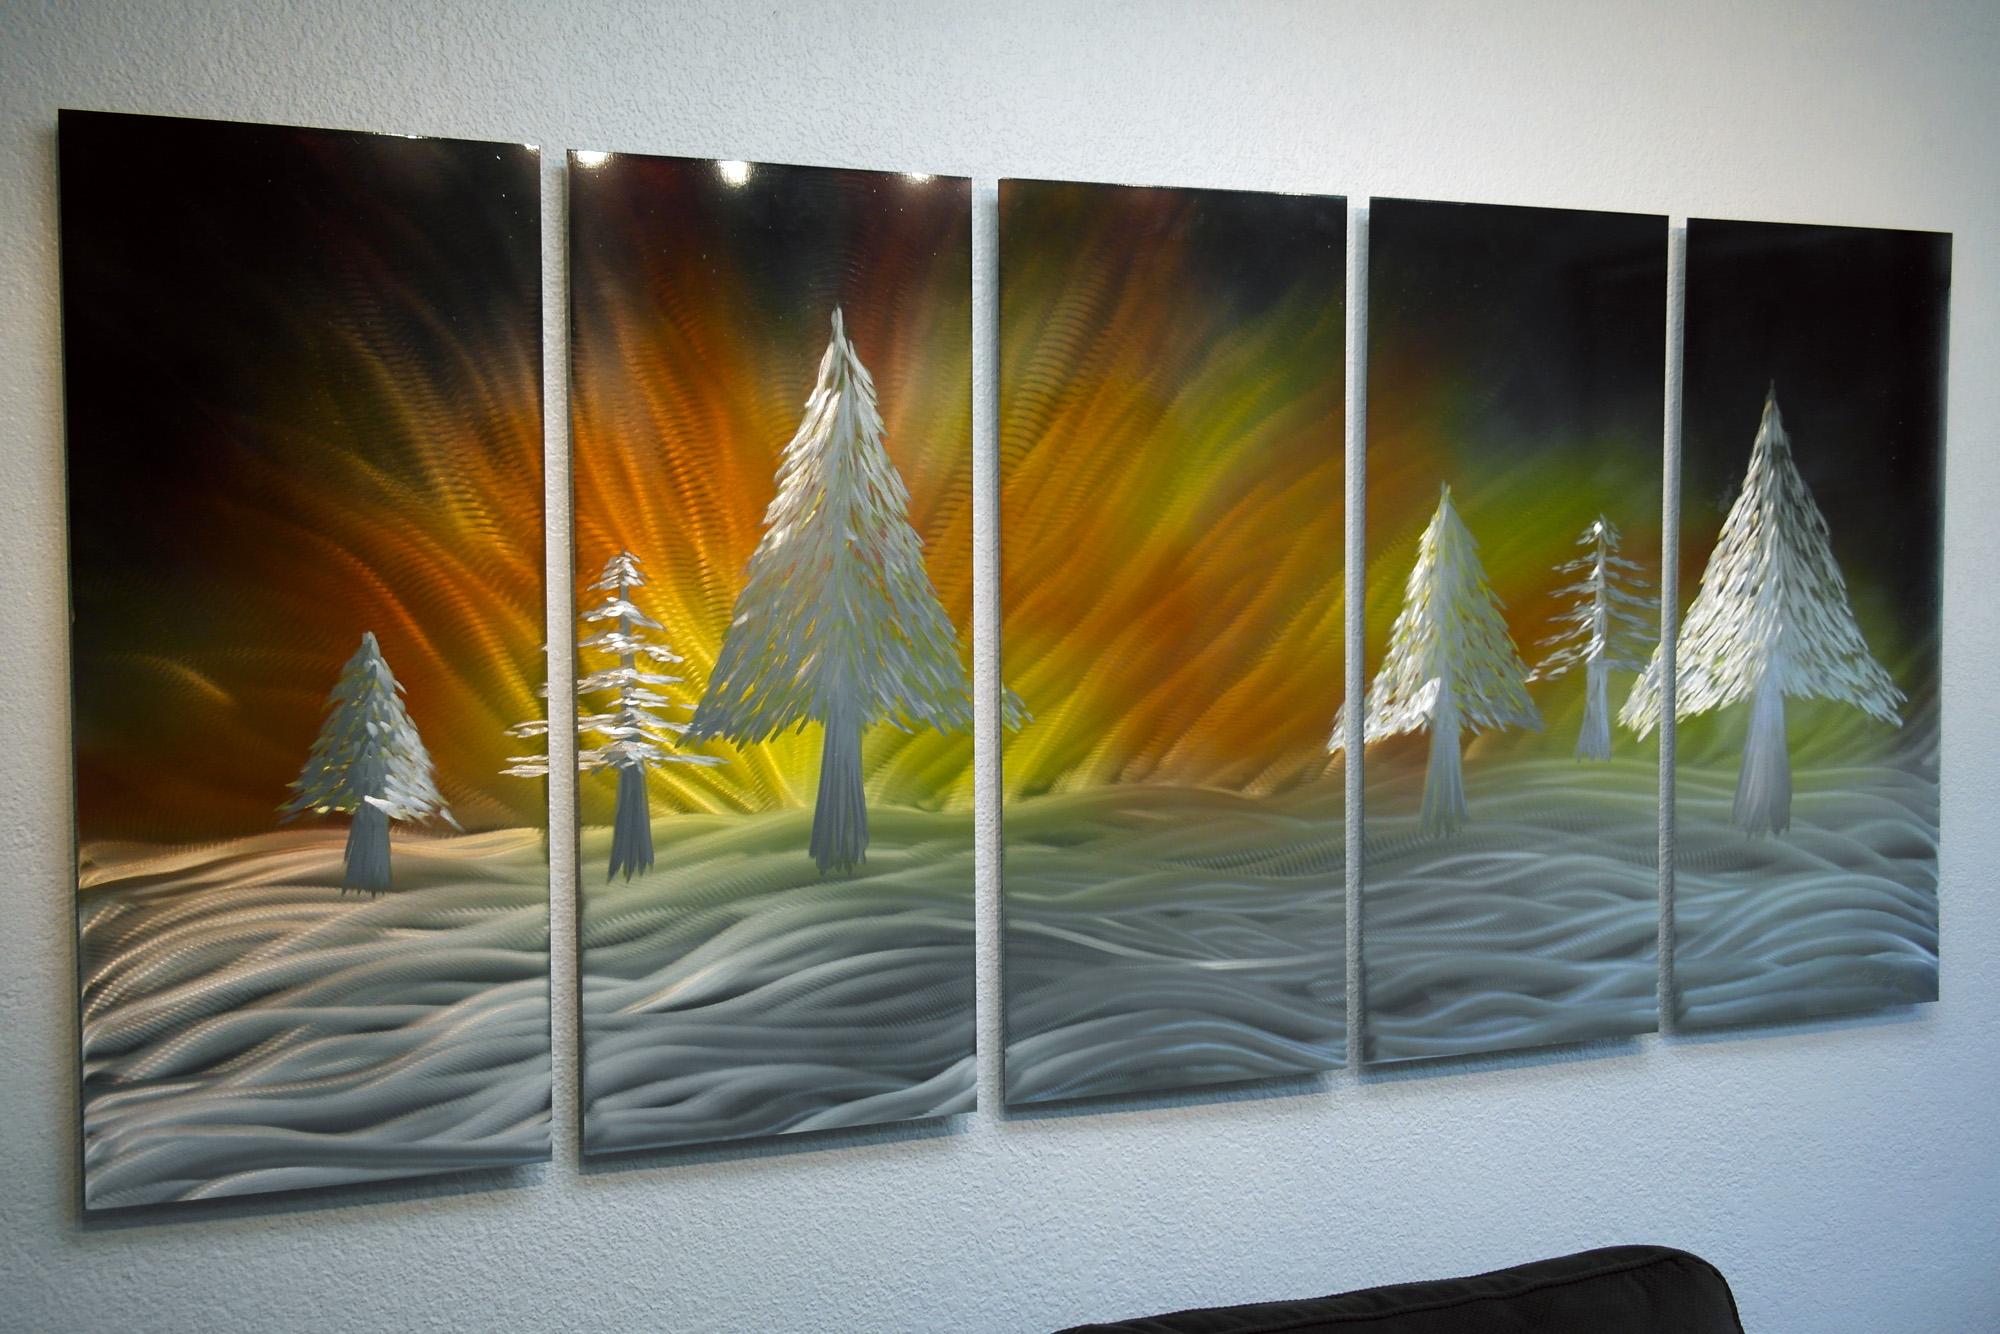 Wiinter Solstice 36x79 - Abstract Metal Wall Art Contemporary Modern Decor  from Inspiring Art Gallery